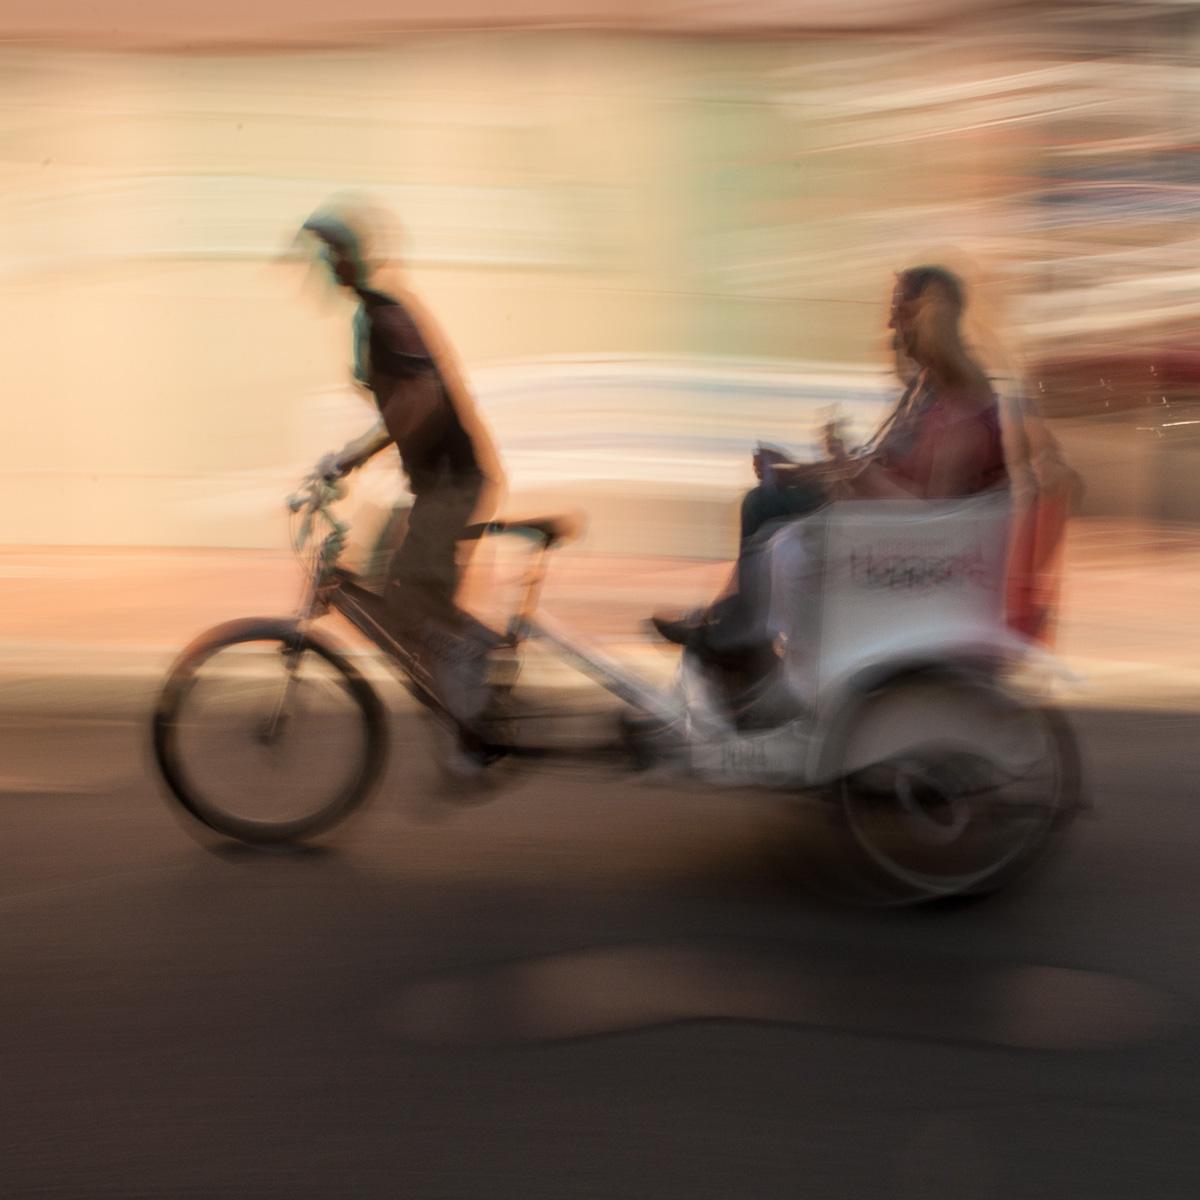 Bourbon Street Pedicab Slurred